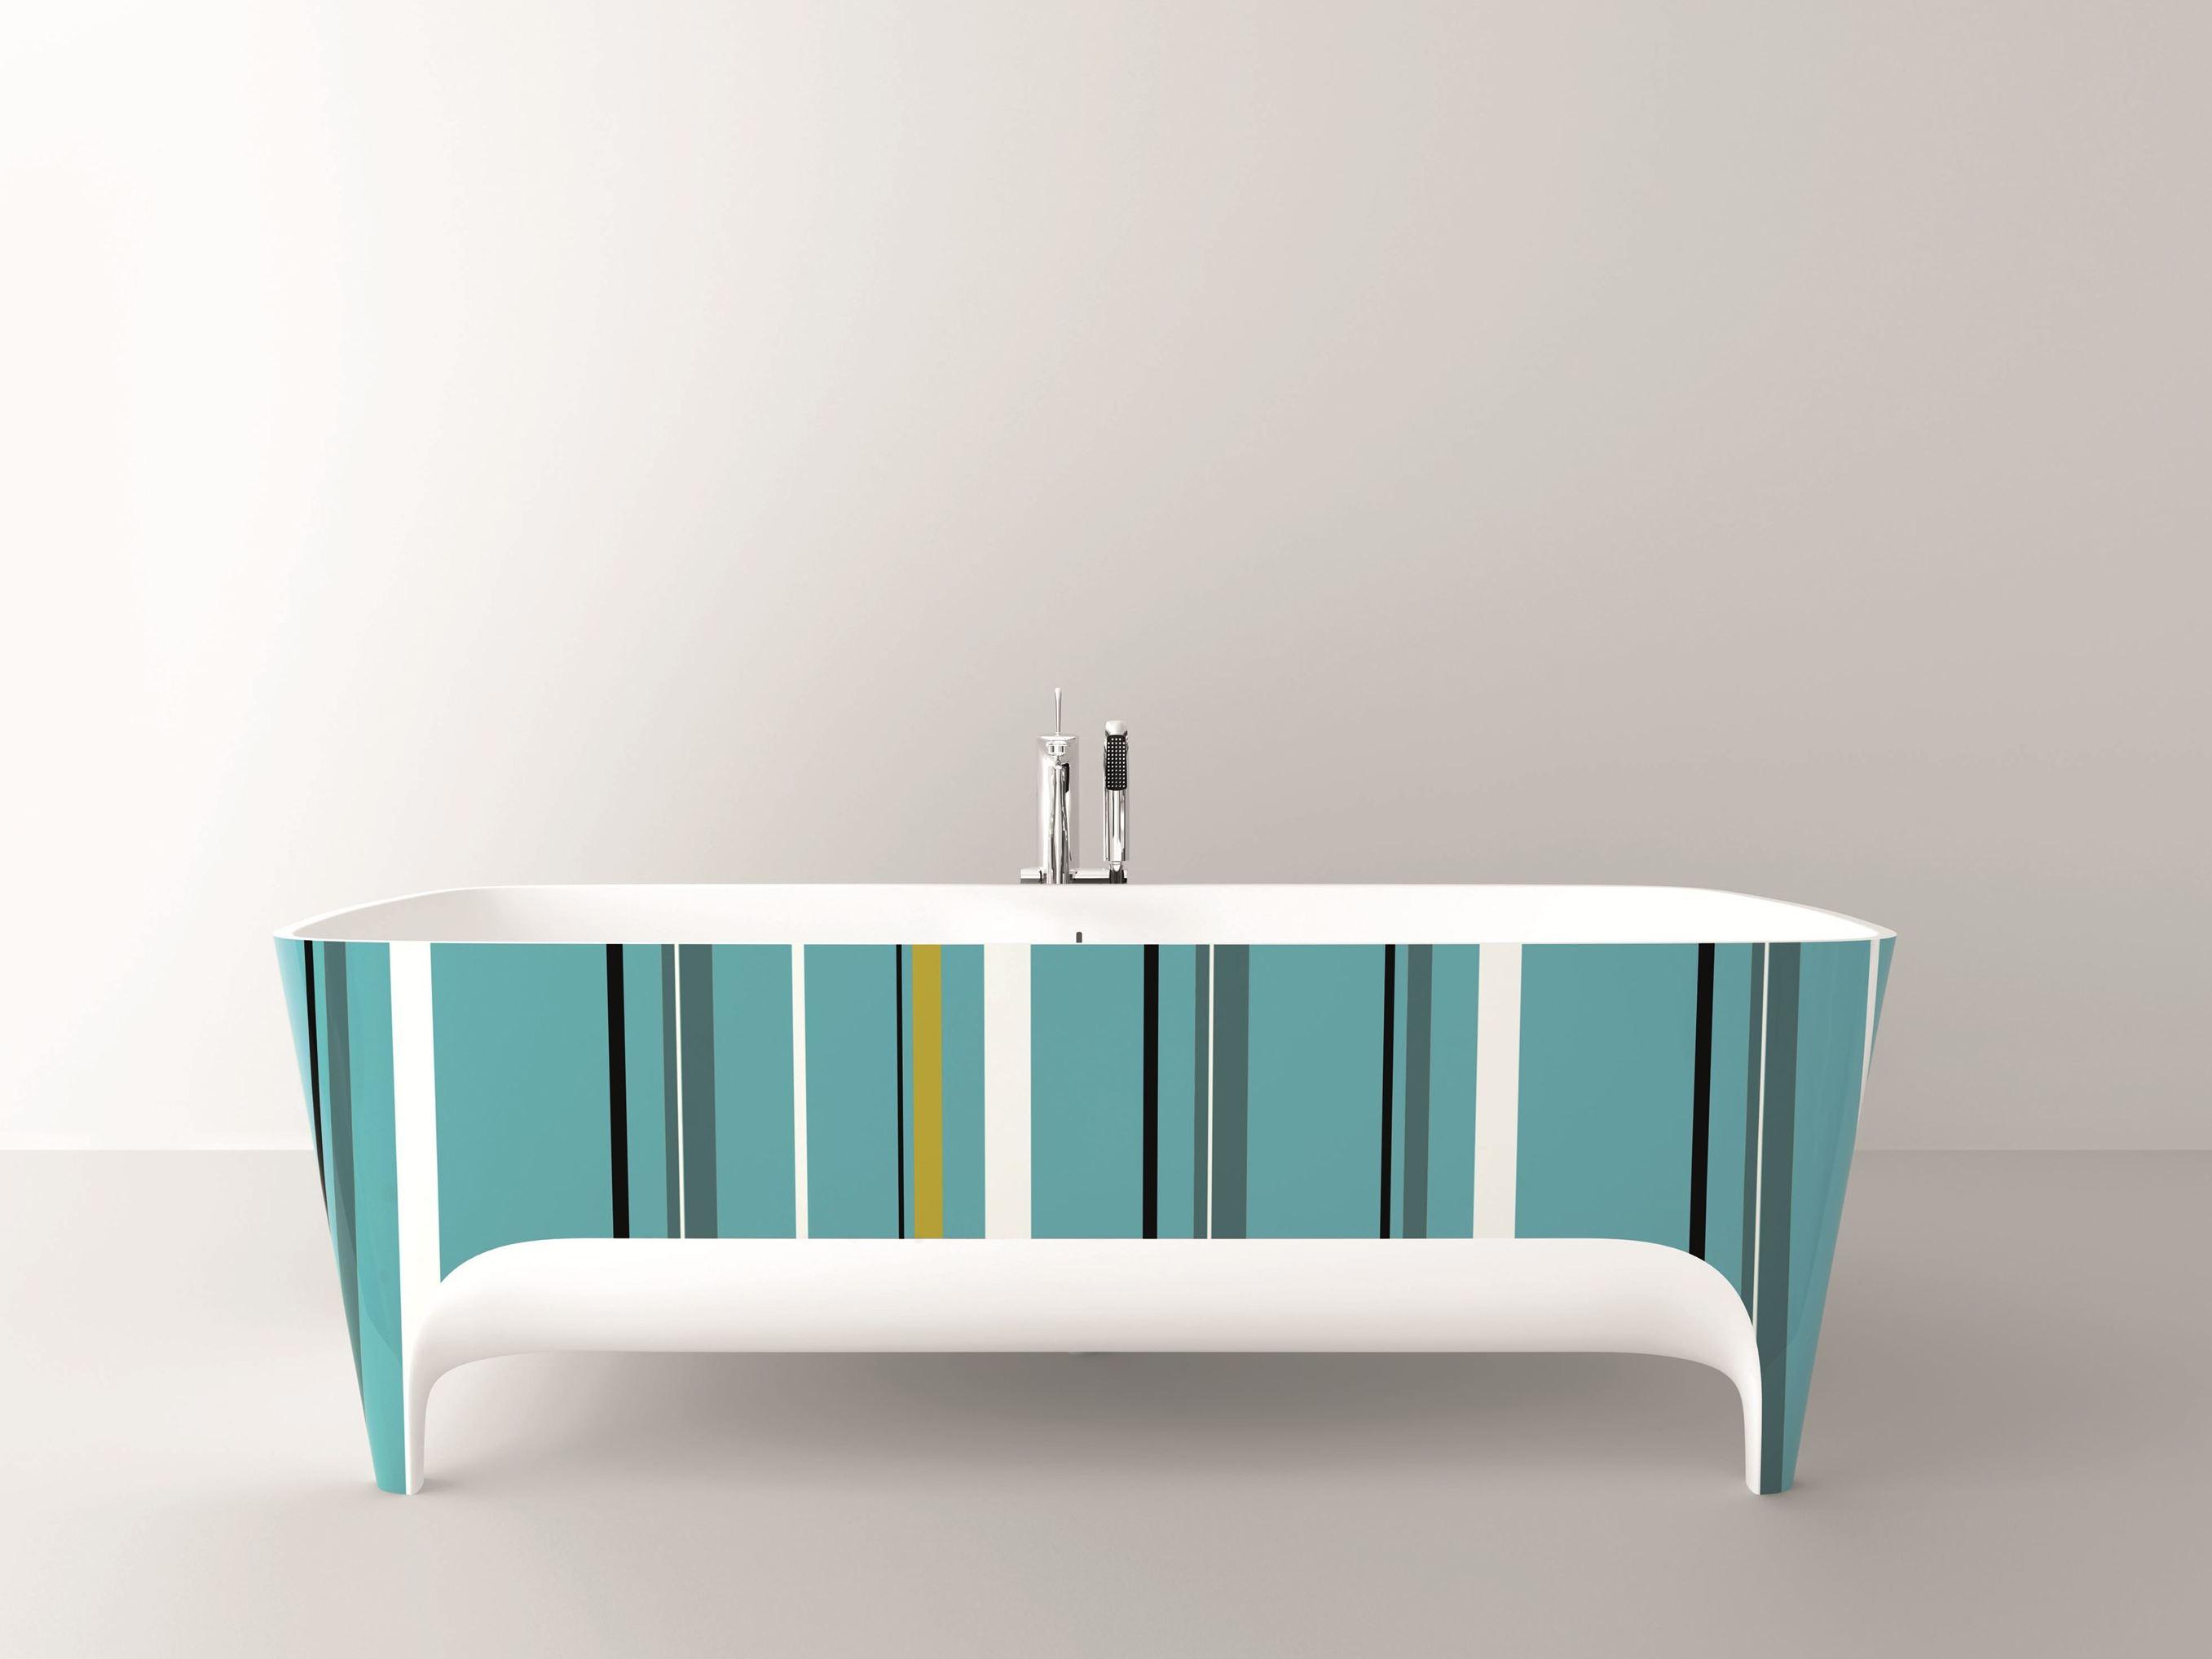 Vasca da bagno moderna prezzi ~ avienix.com for .